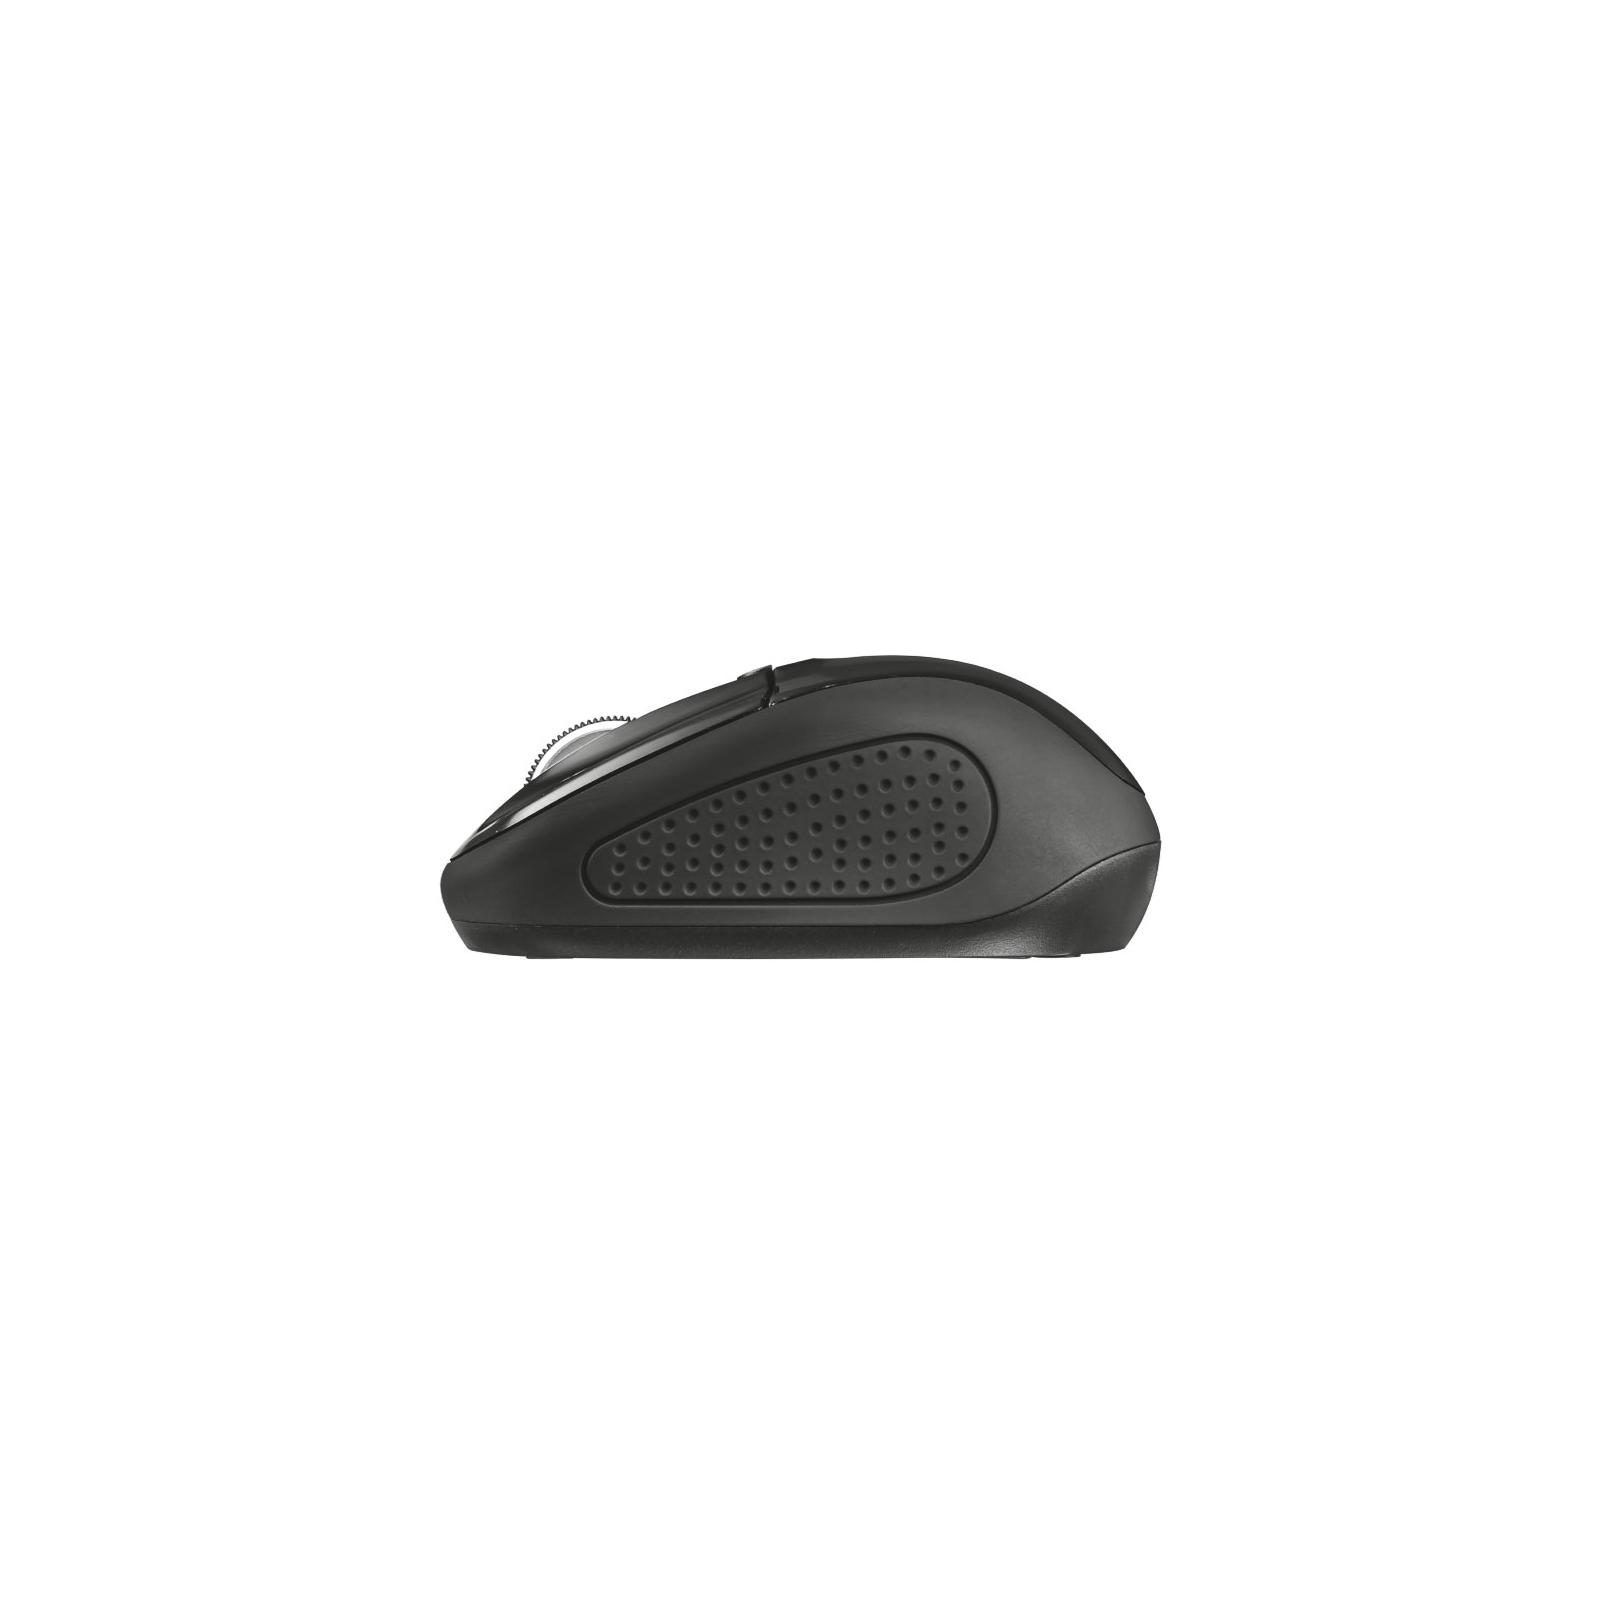 Мышка Trust Primo Wireless Mouse Red (20787) изображение 3